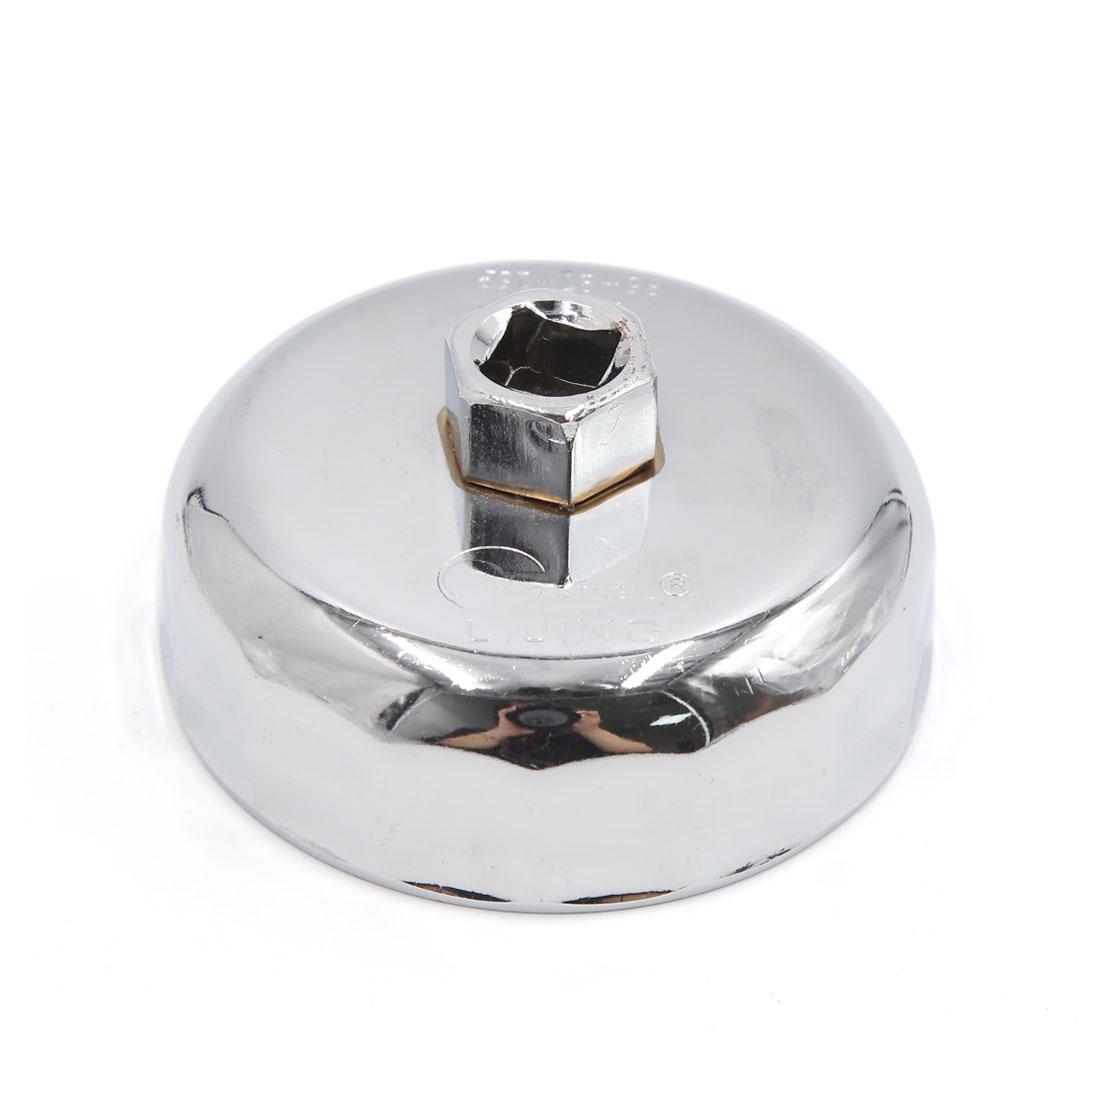 13mm Square Socket 16 Flutes 87mm Inside Diameter Cap-Type Oil Filter Wrench Spanner for Car Vehicle